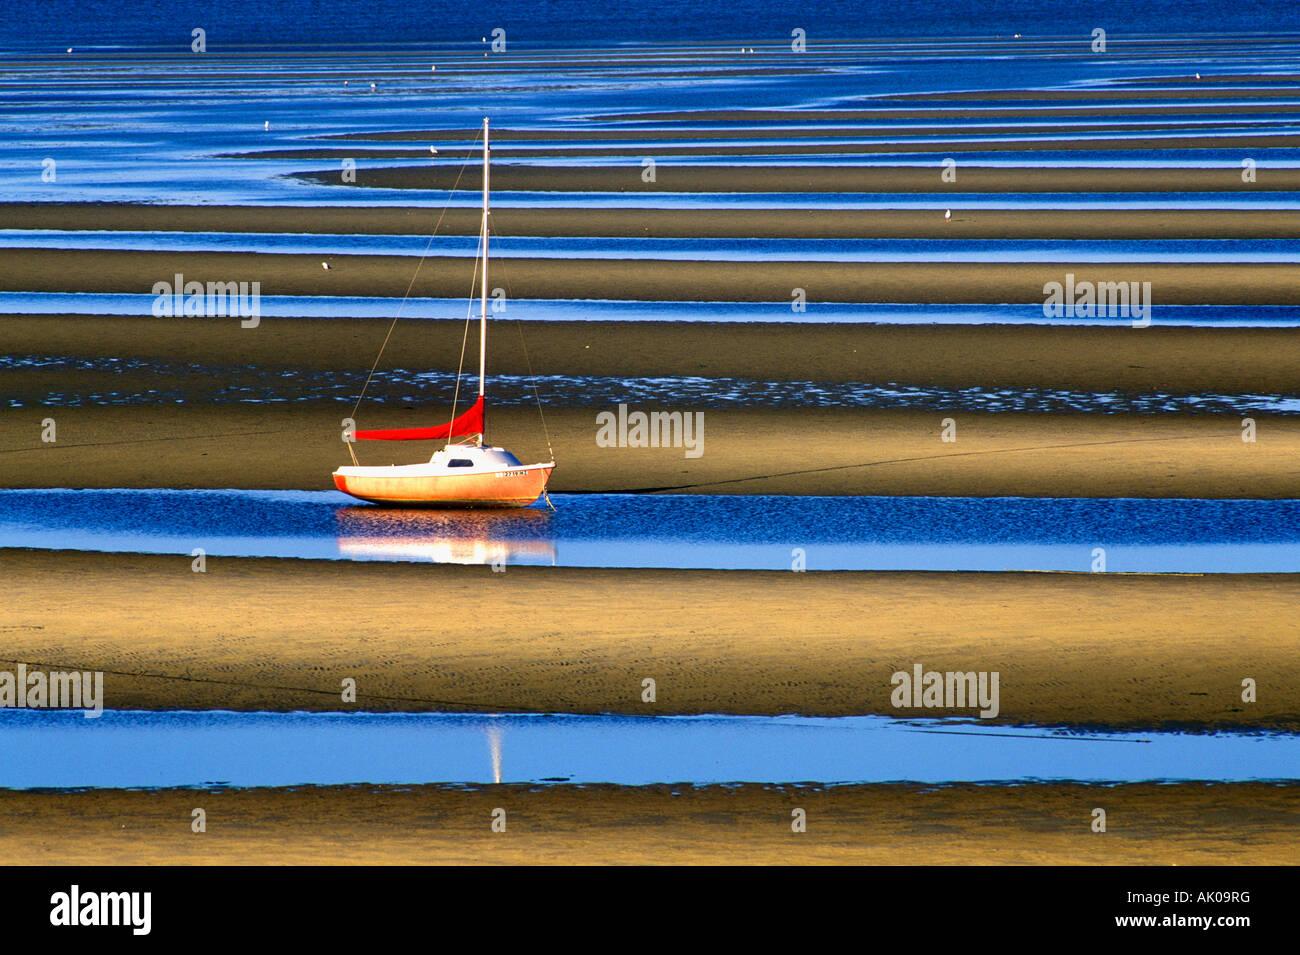 Sailboat anchored in tidal flats, Cape Cod Bay, Eastham, Cape Cod, MA - Stock Image